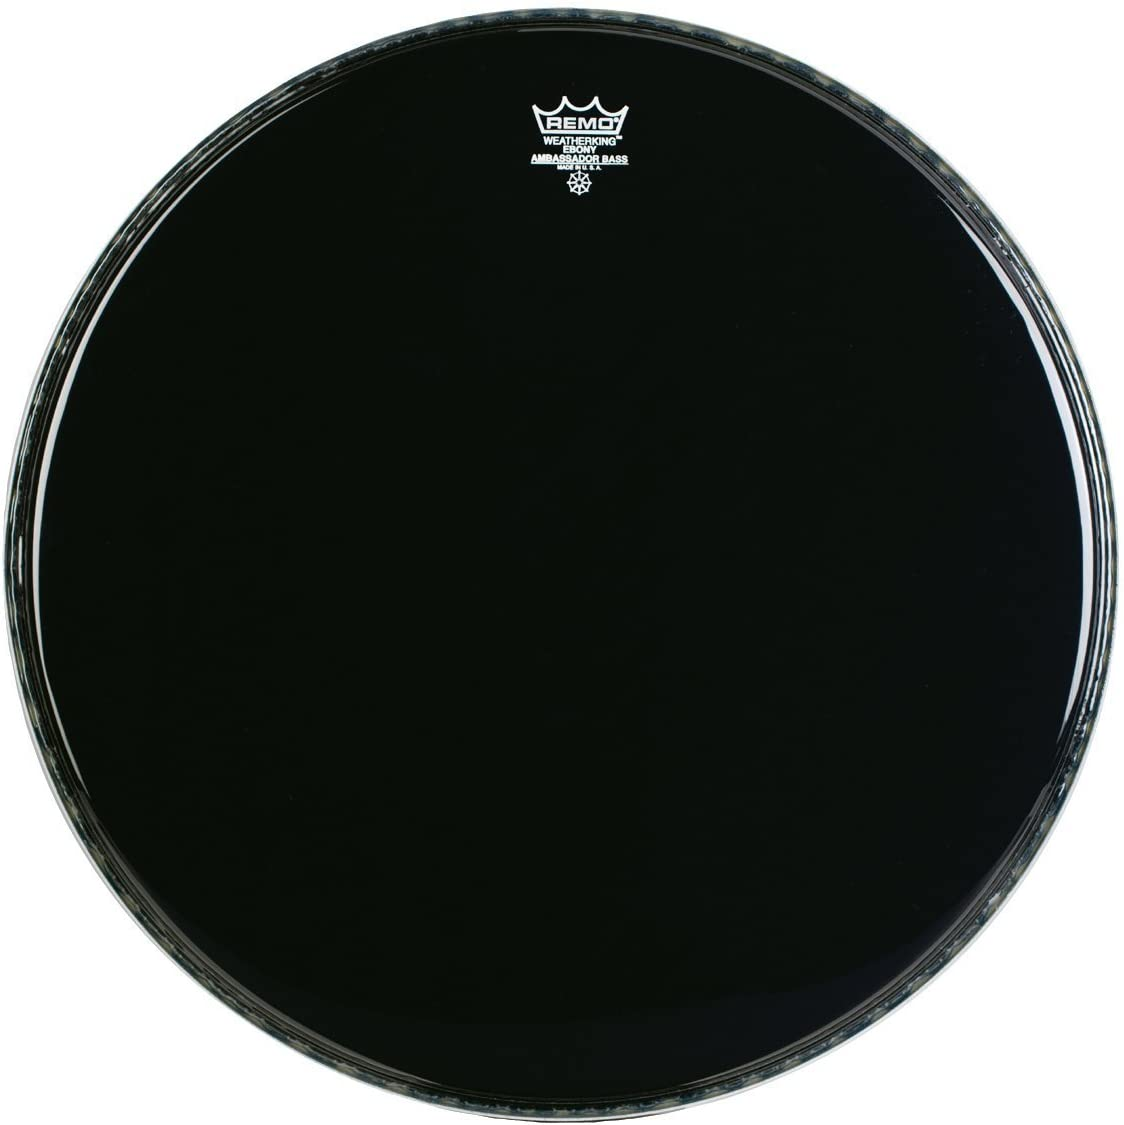 Remo ES1022-00 22-Inch Ebony Ambassador Bass Drum Head 61K8NMMFsVL